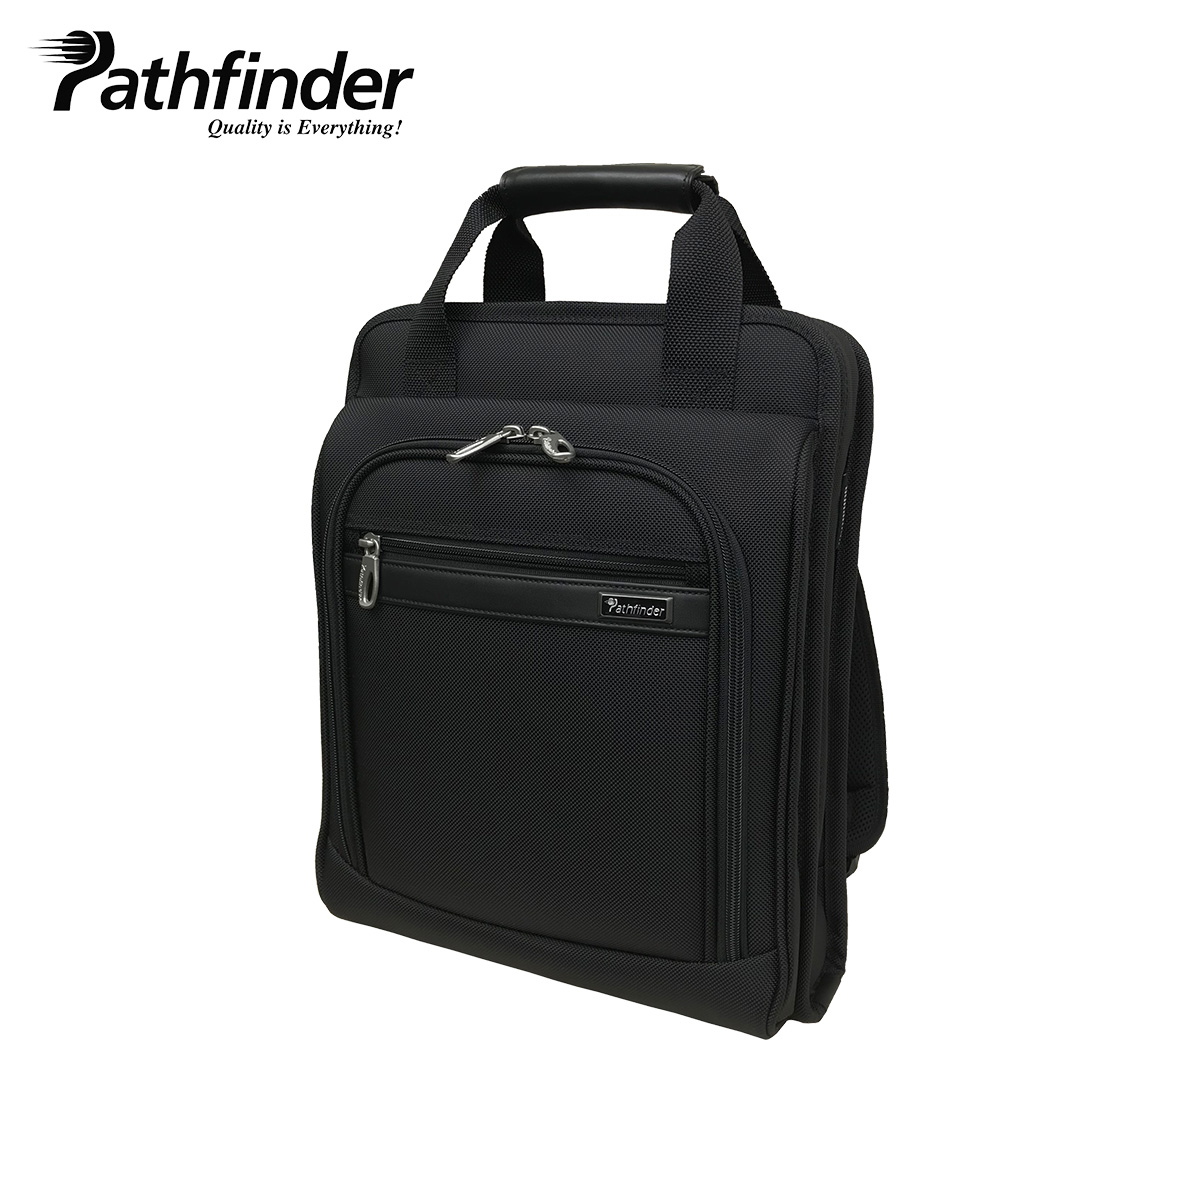 Pathfinder パスファインダー バッグ ビジネスバッグ リュック バックパック メンズ REVOLUTION XT ブラック 黒 PF6814B